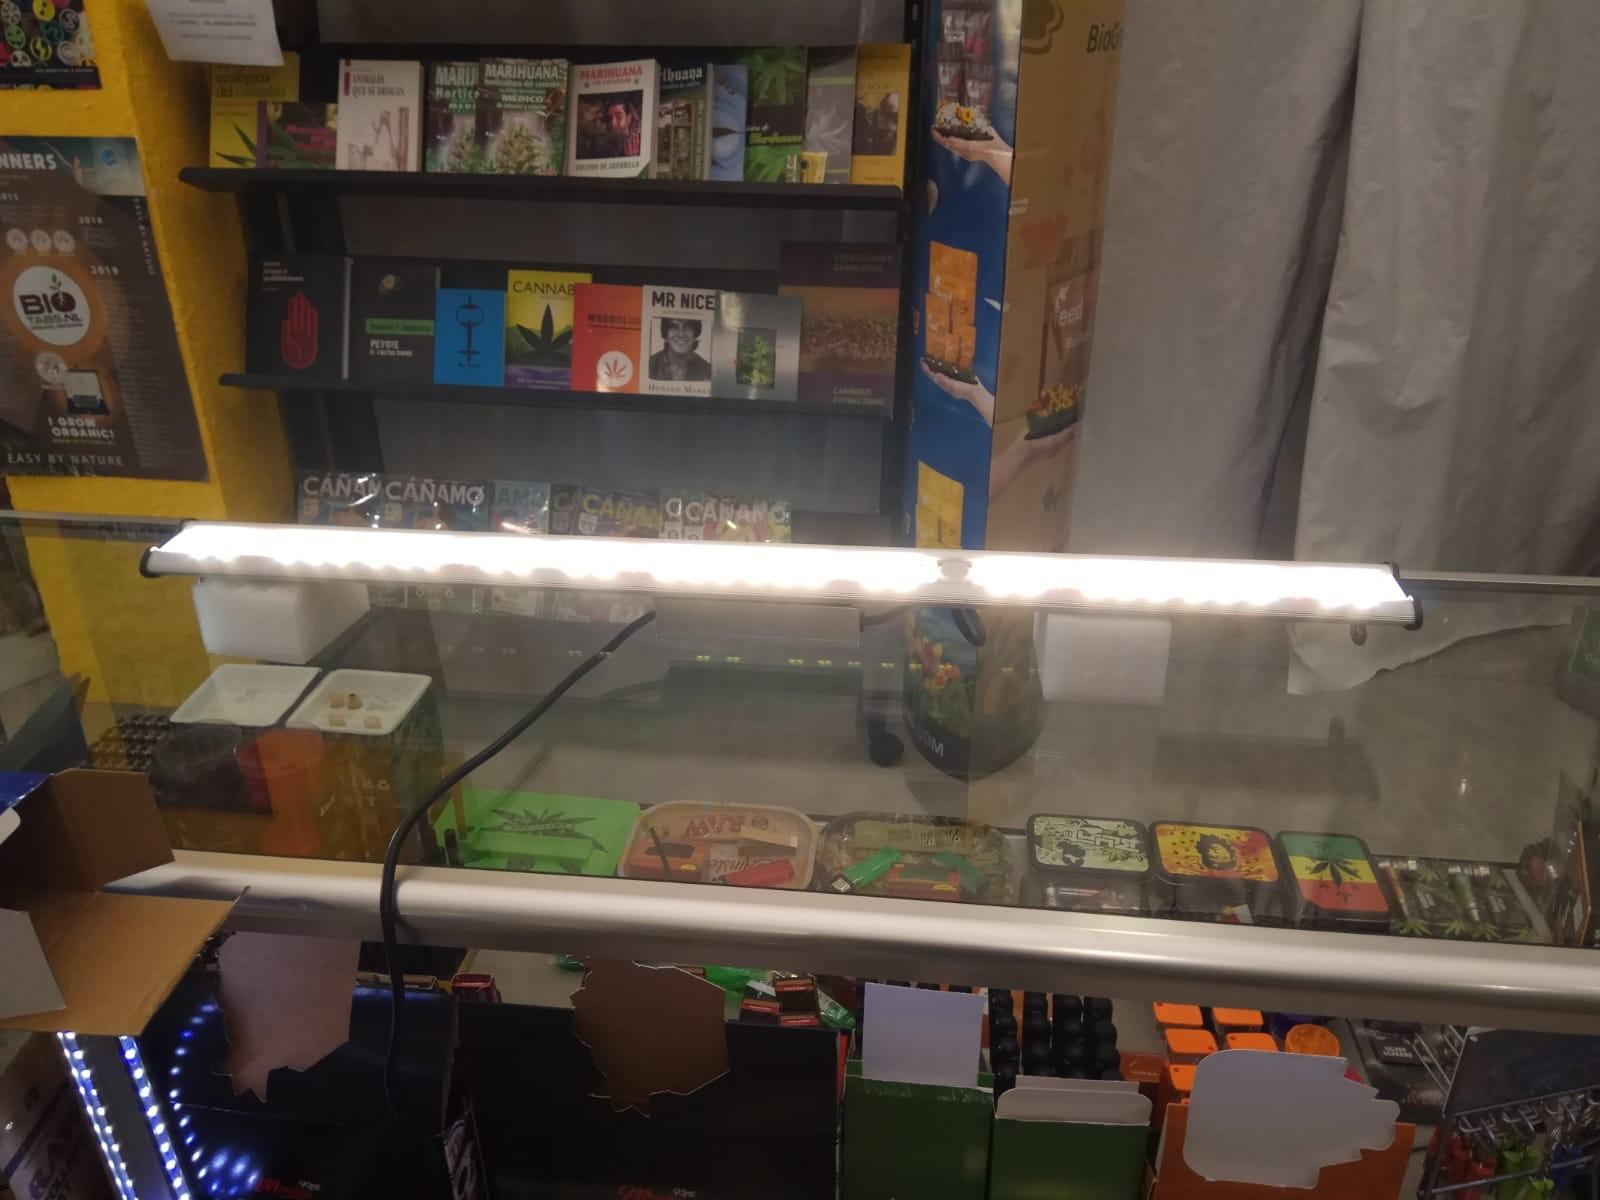 BARRA LED DAYSTAR 100w (PLATINUM HORTICULTURE 1